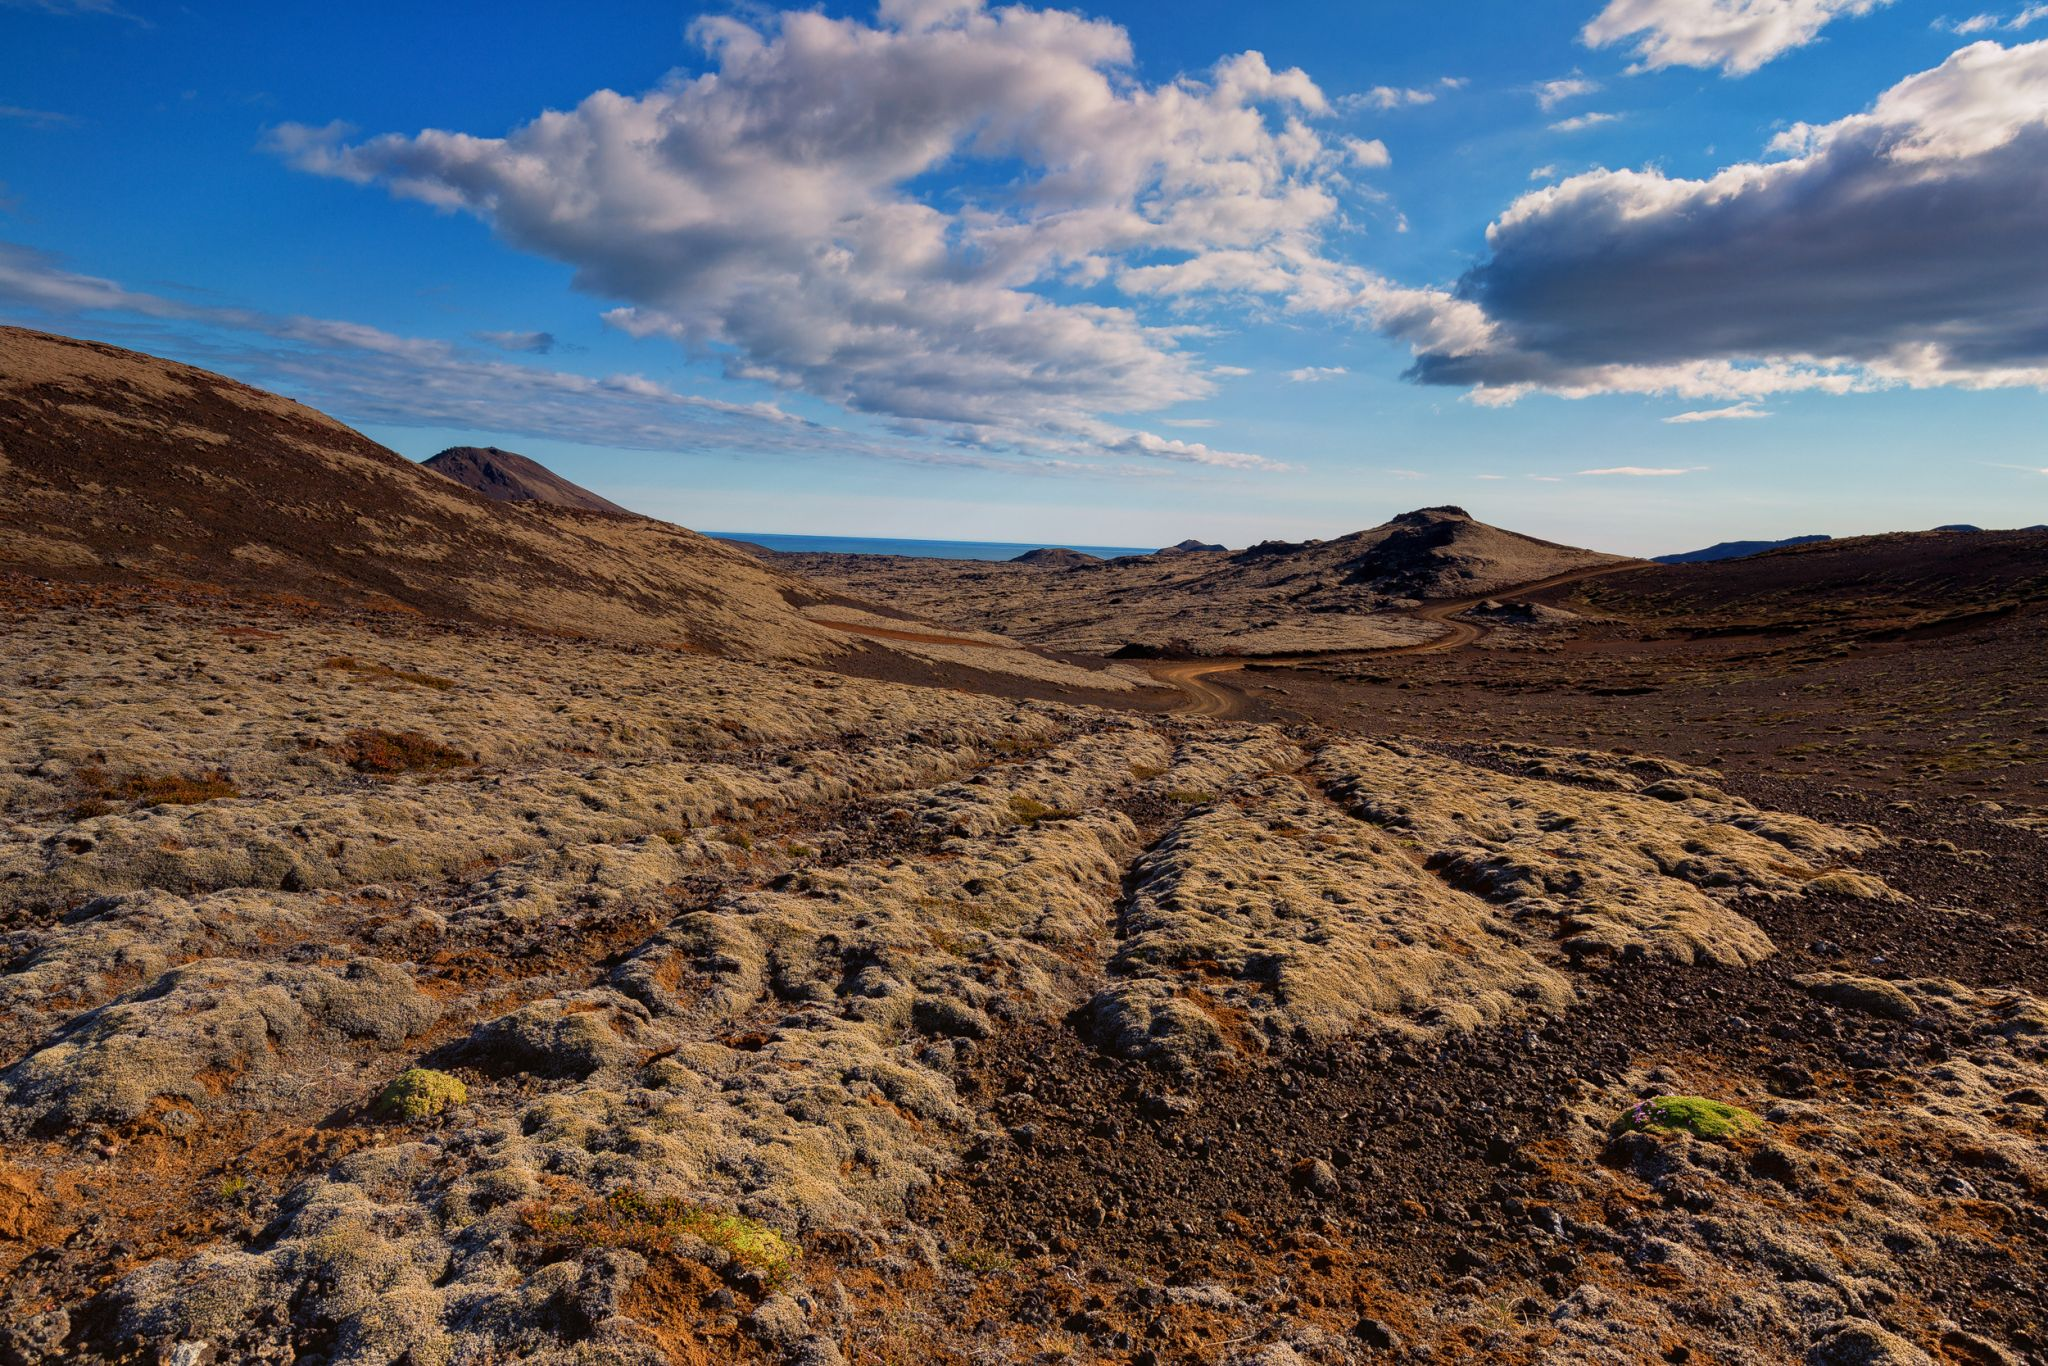 Gravel Road Iceland, Iceland